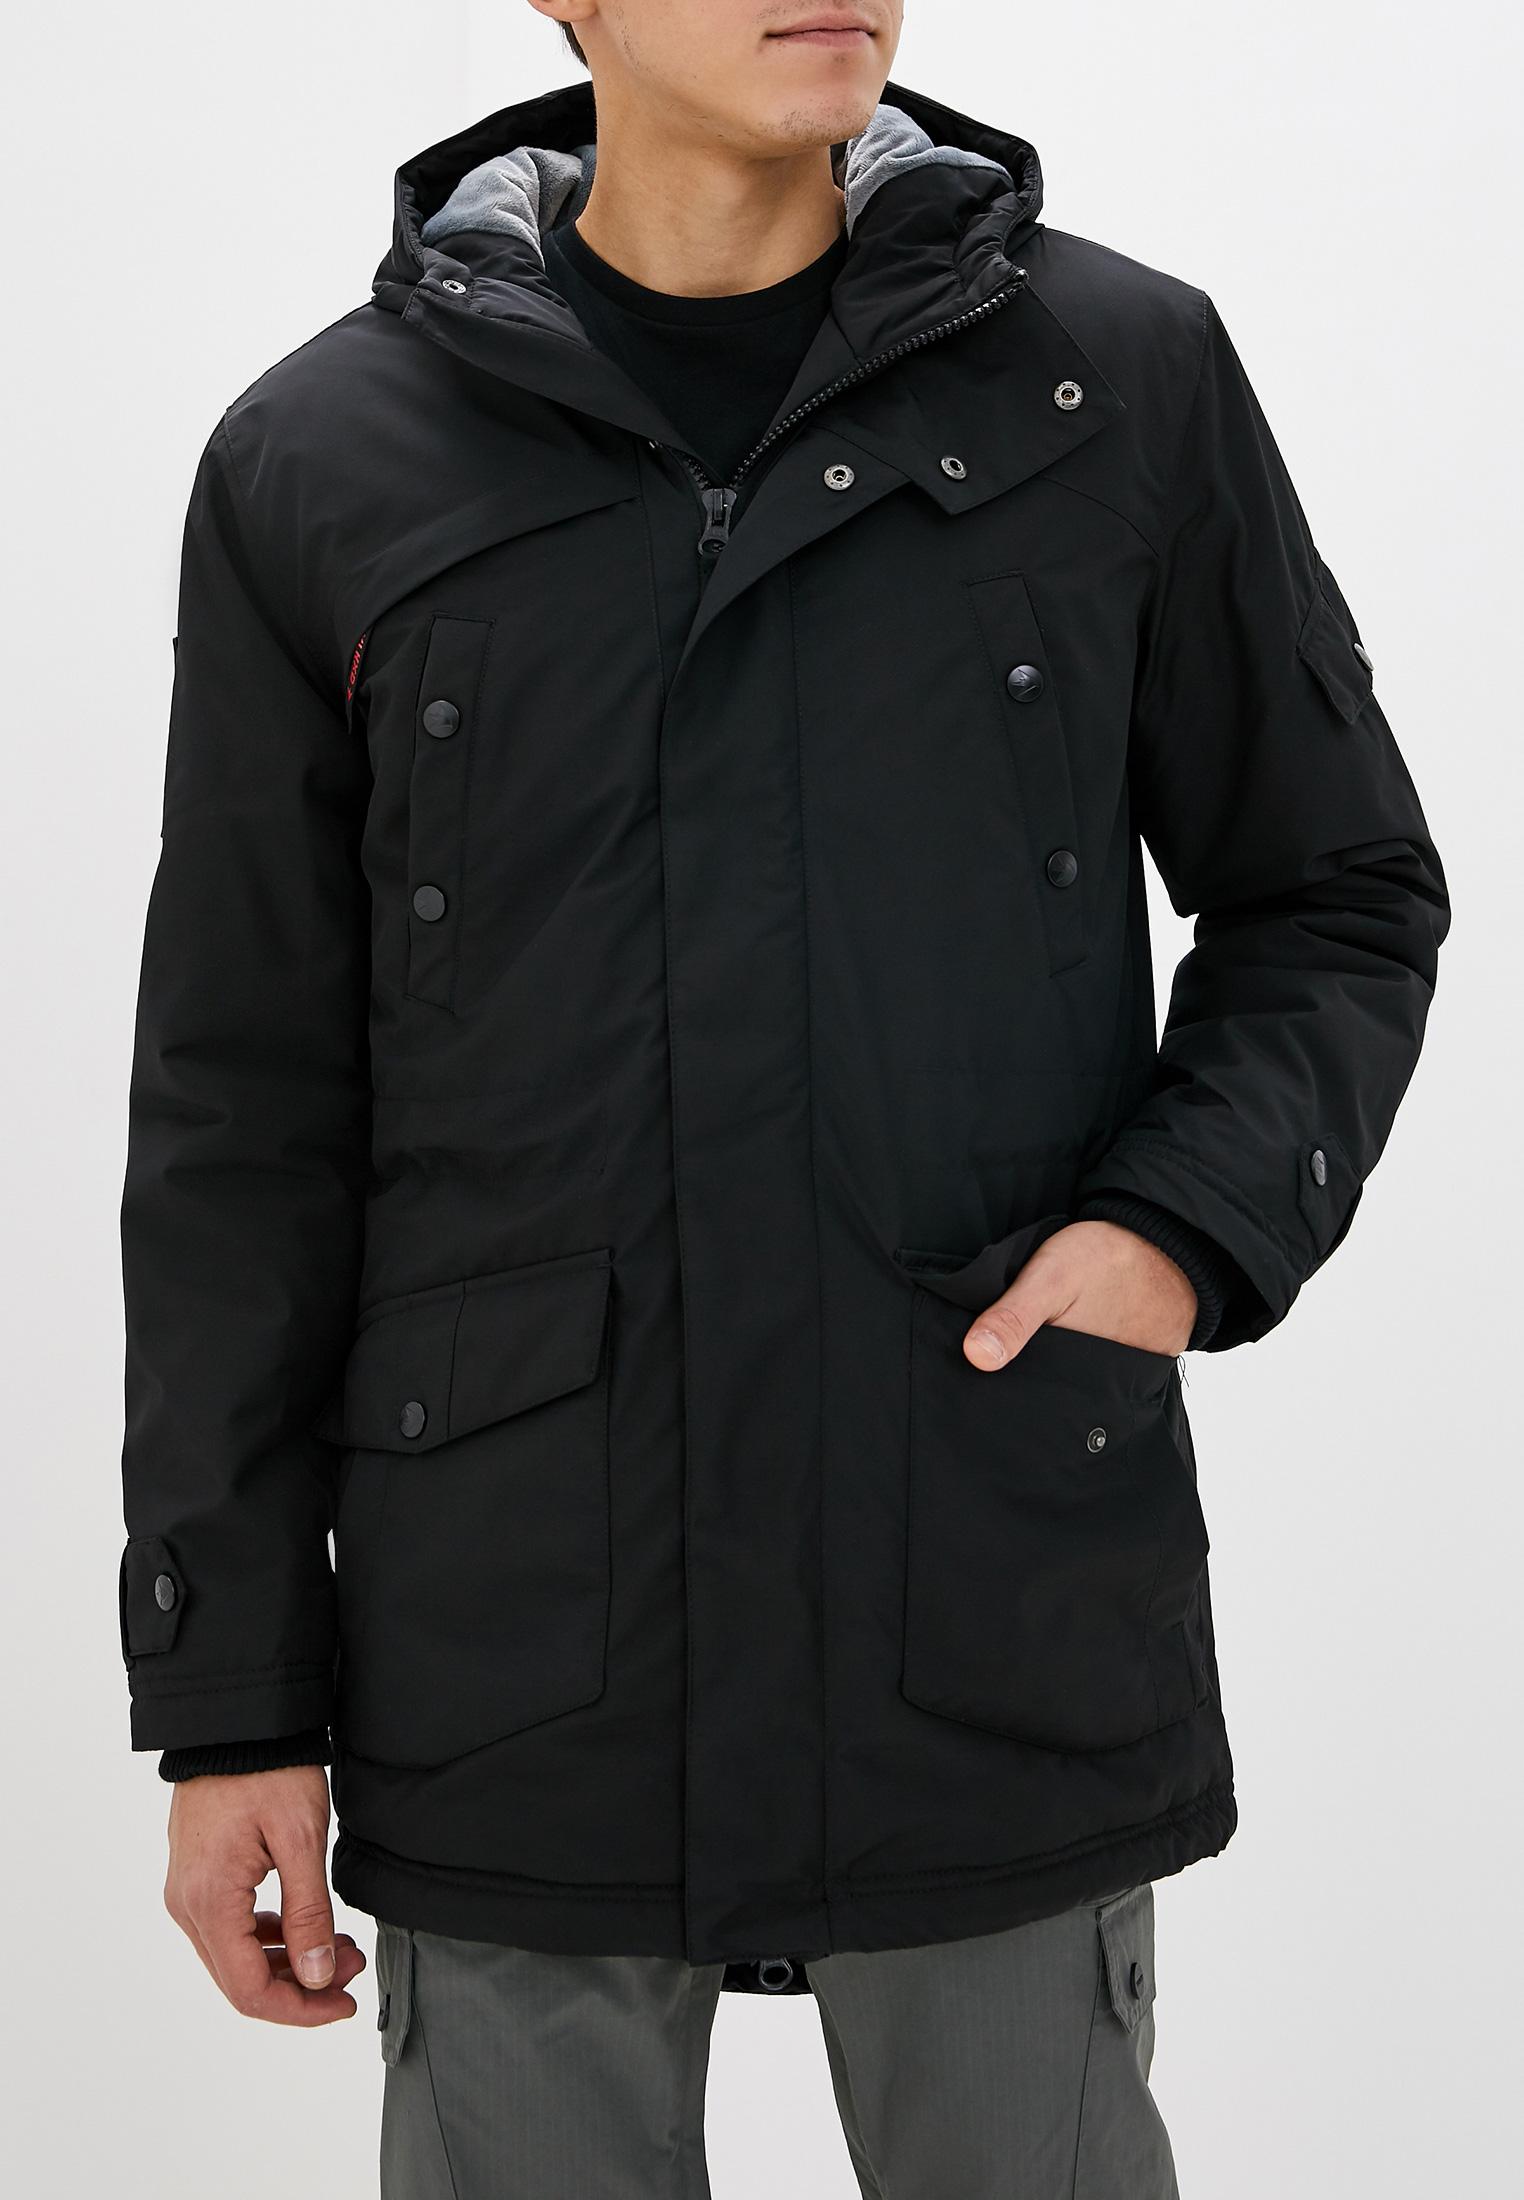 Мужская верхняя одежда Trailhead MJK455